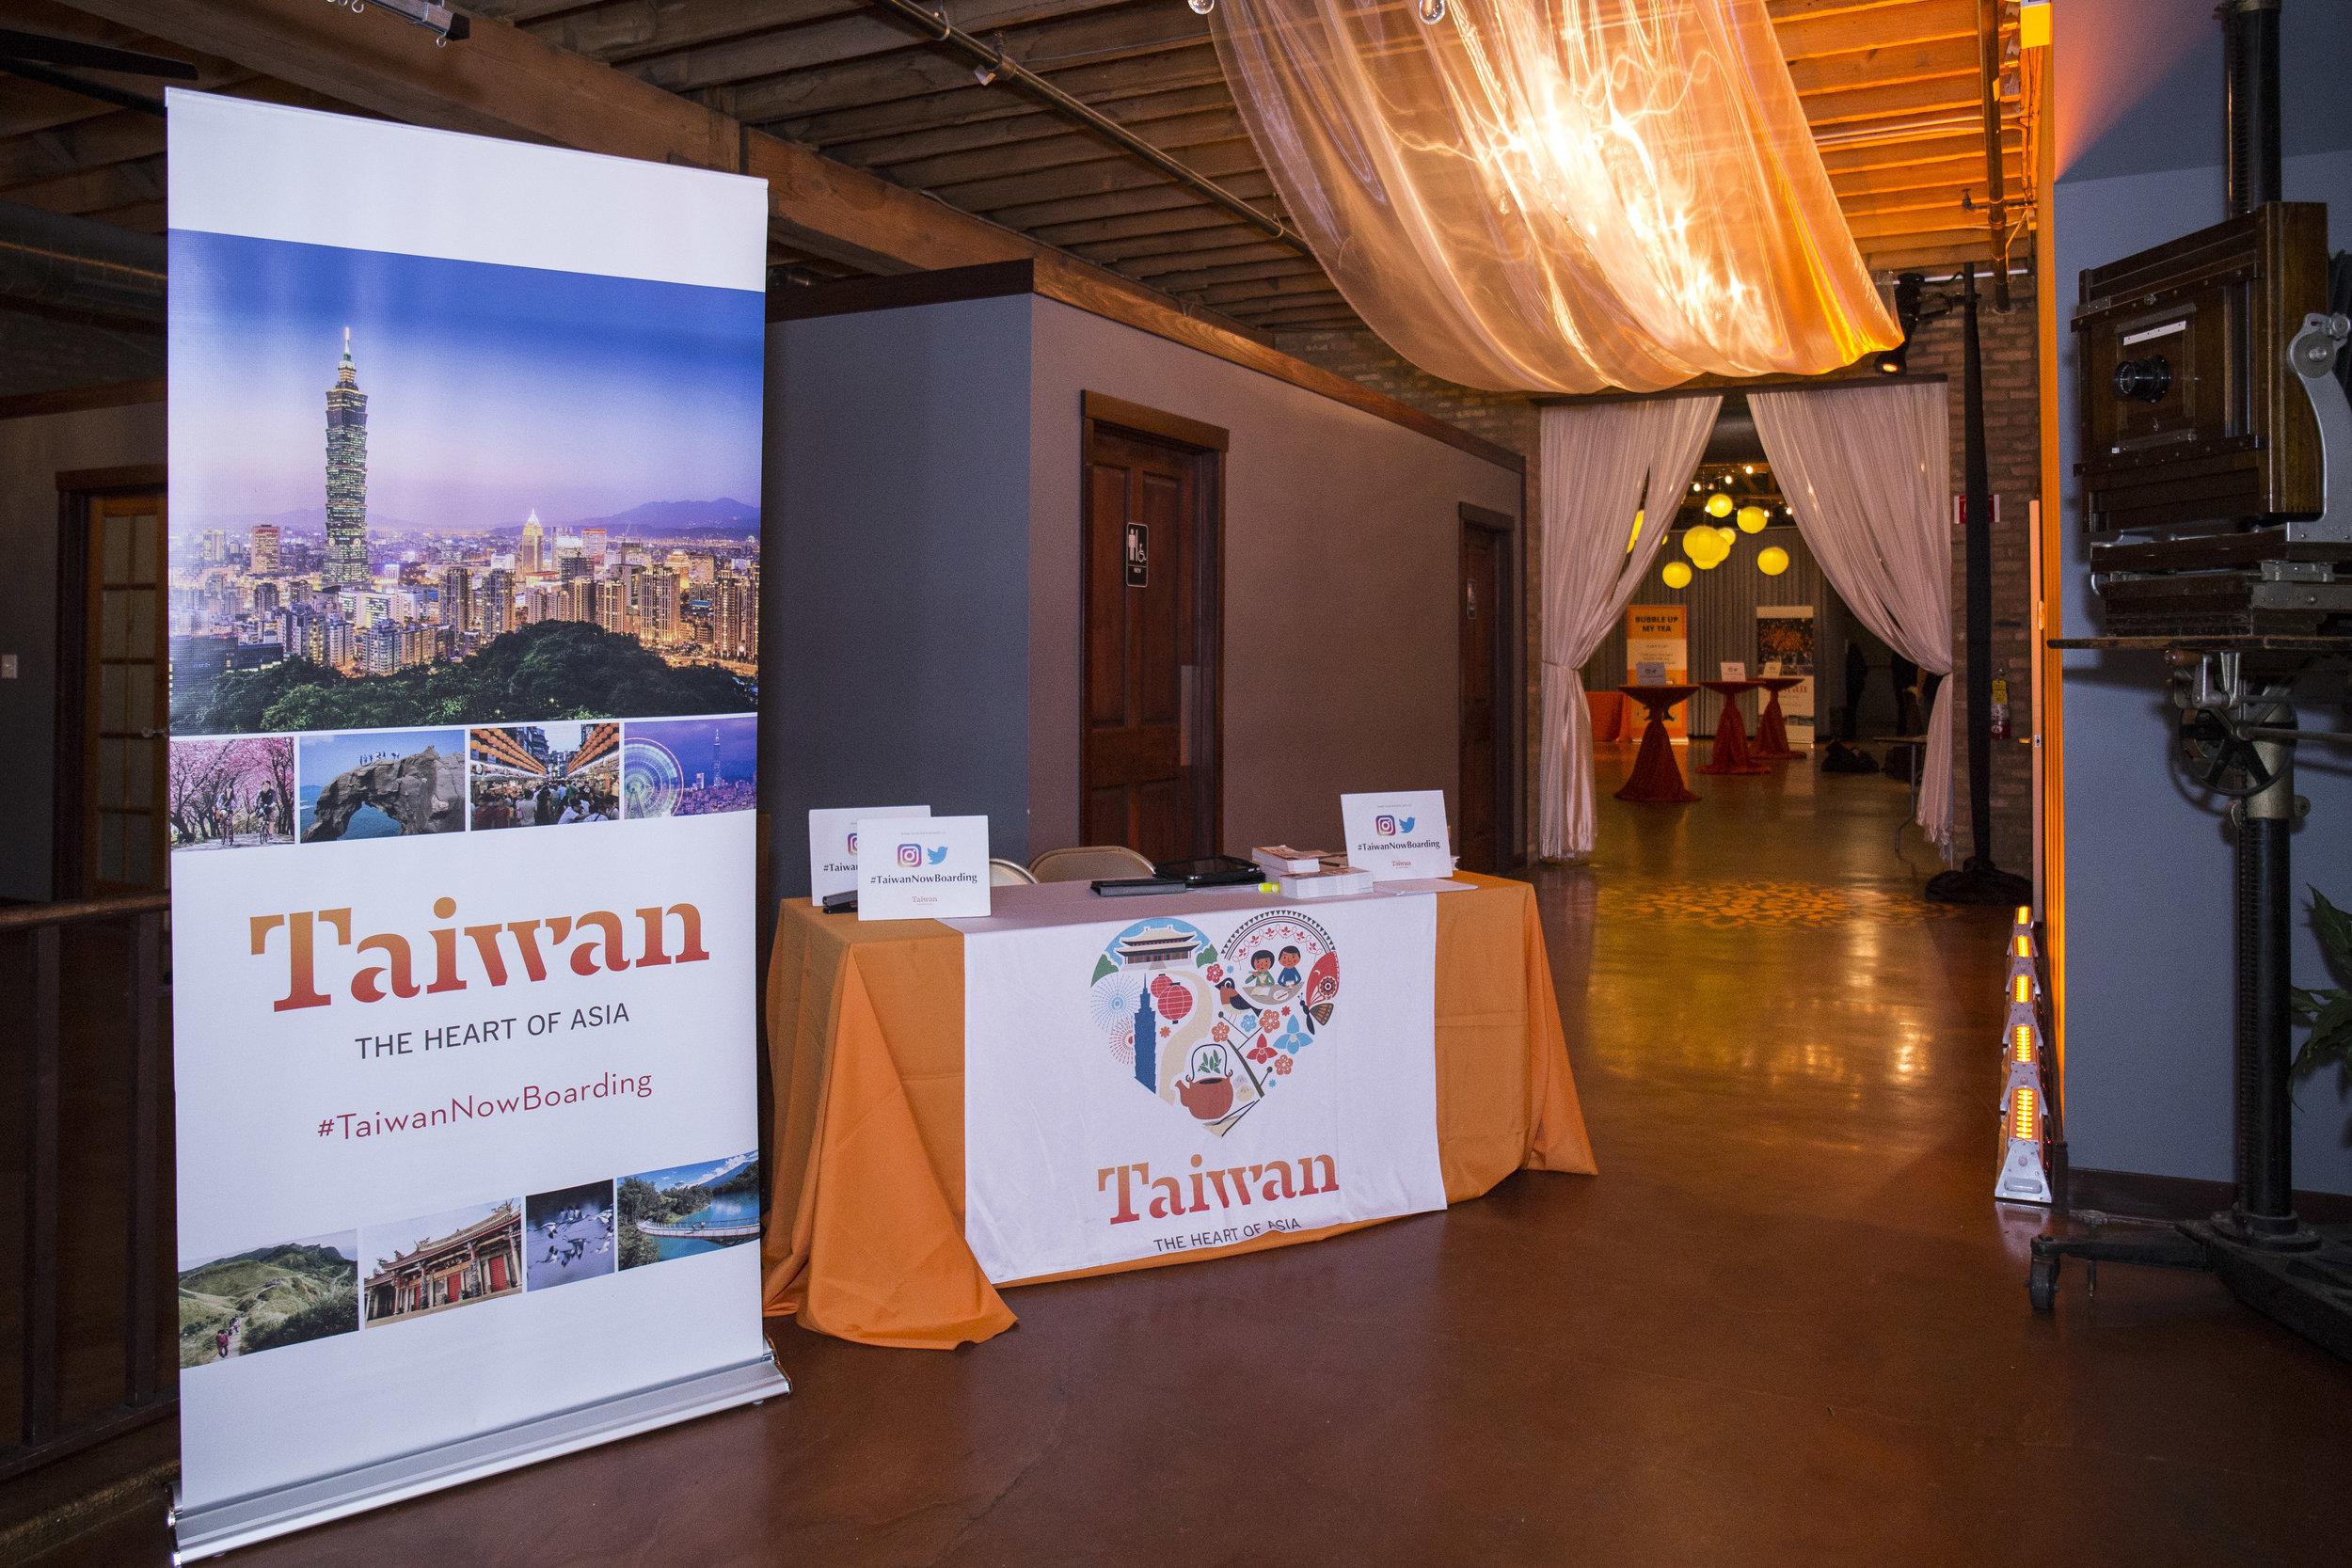 Tourism Events - Promote your place